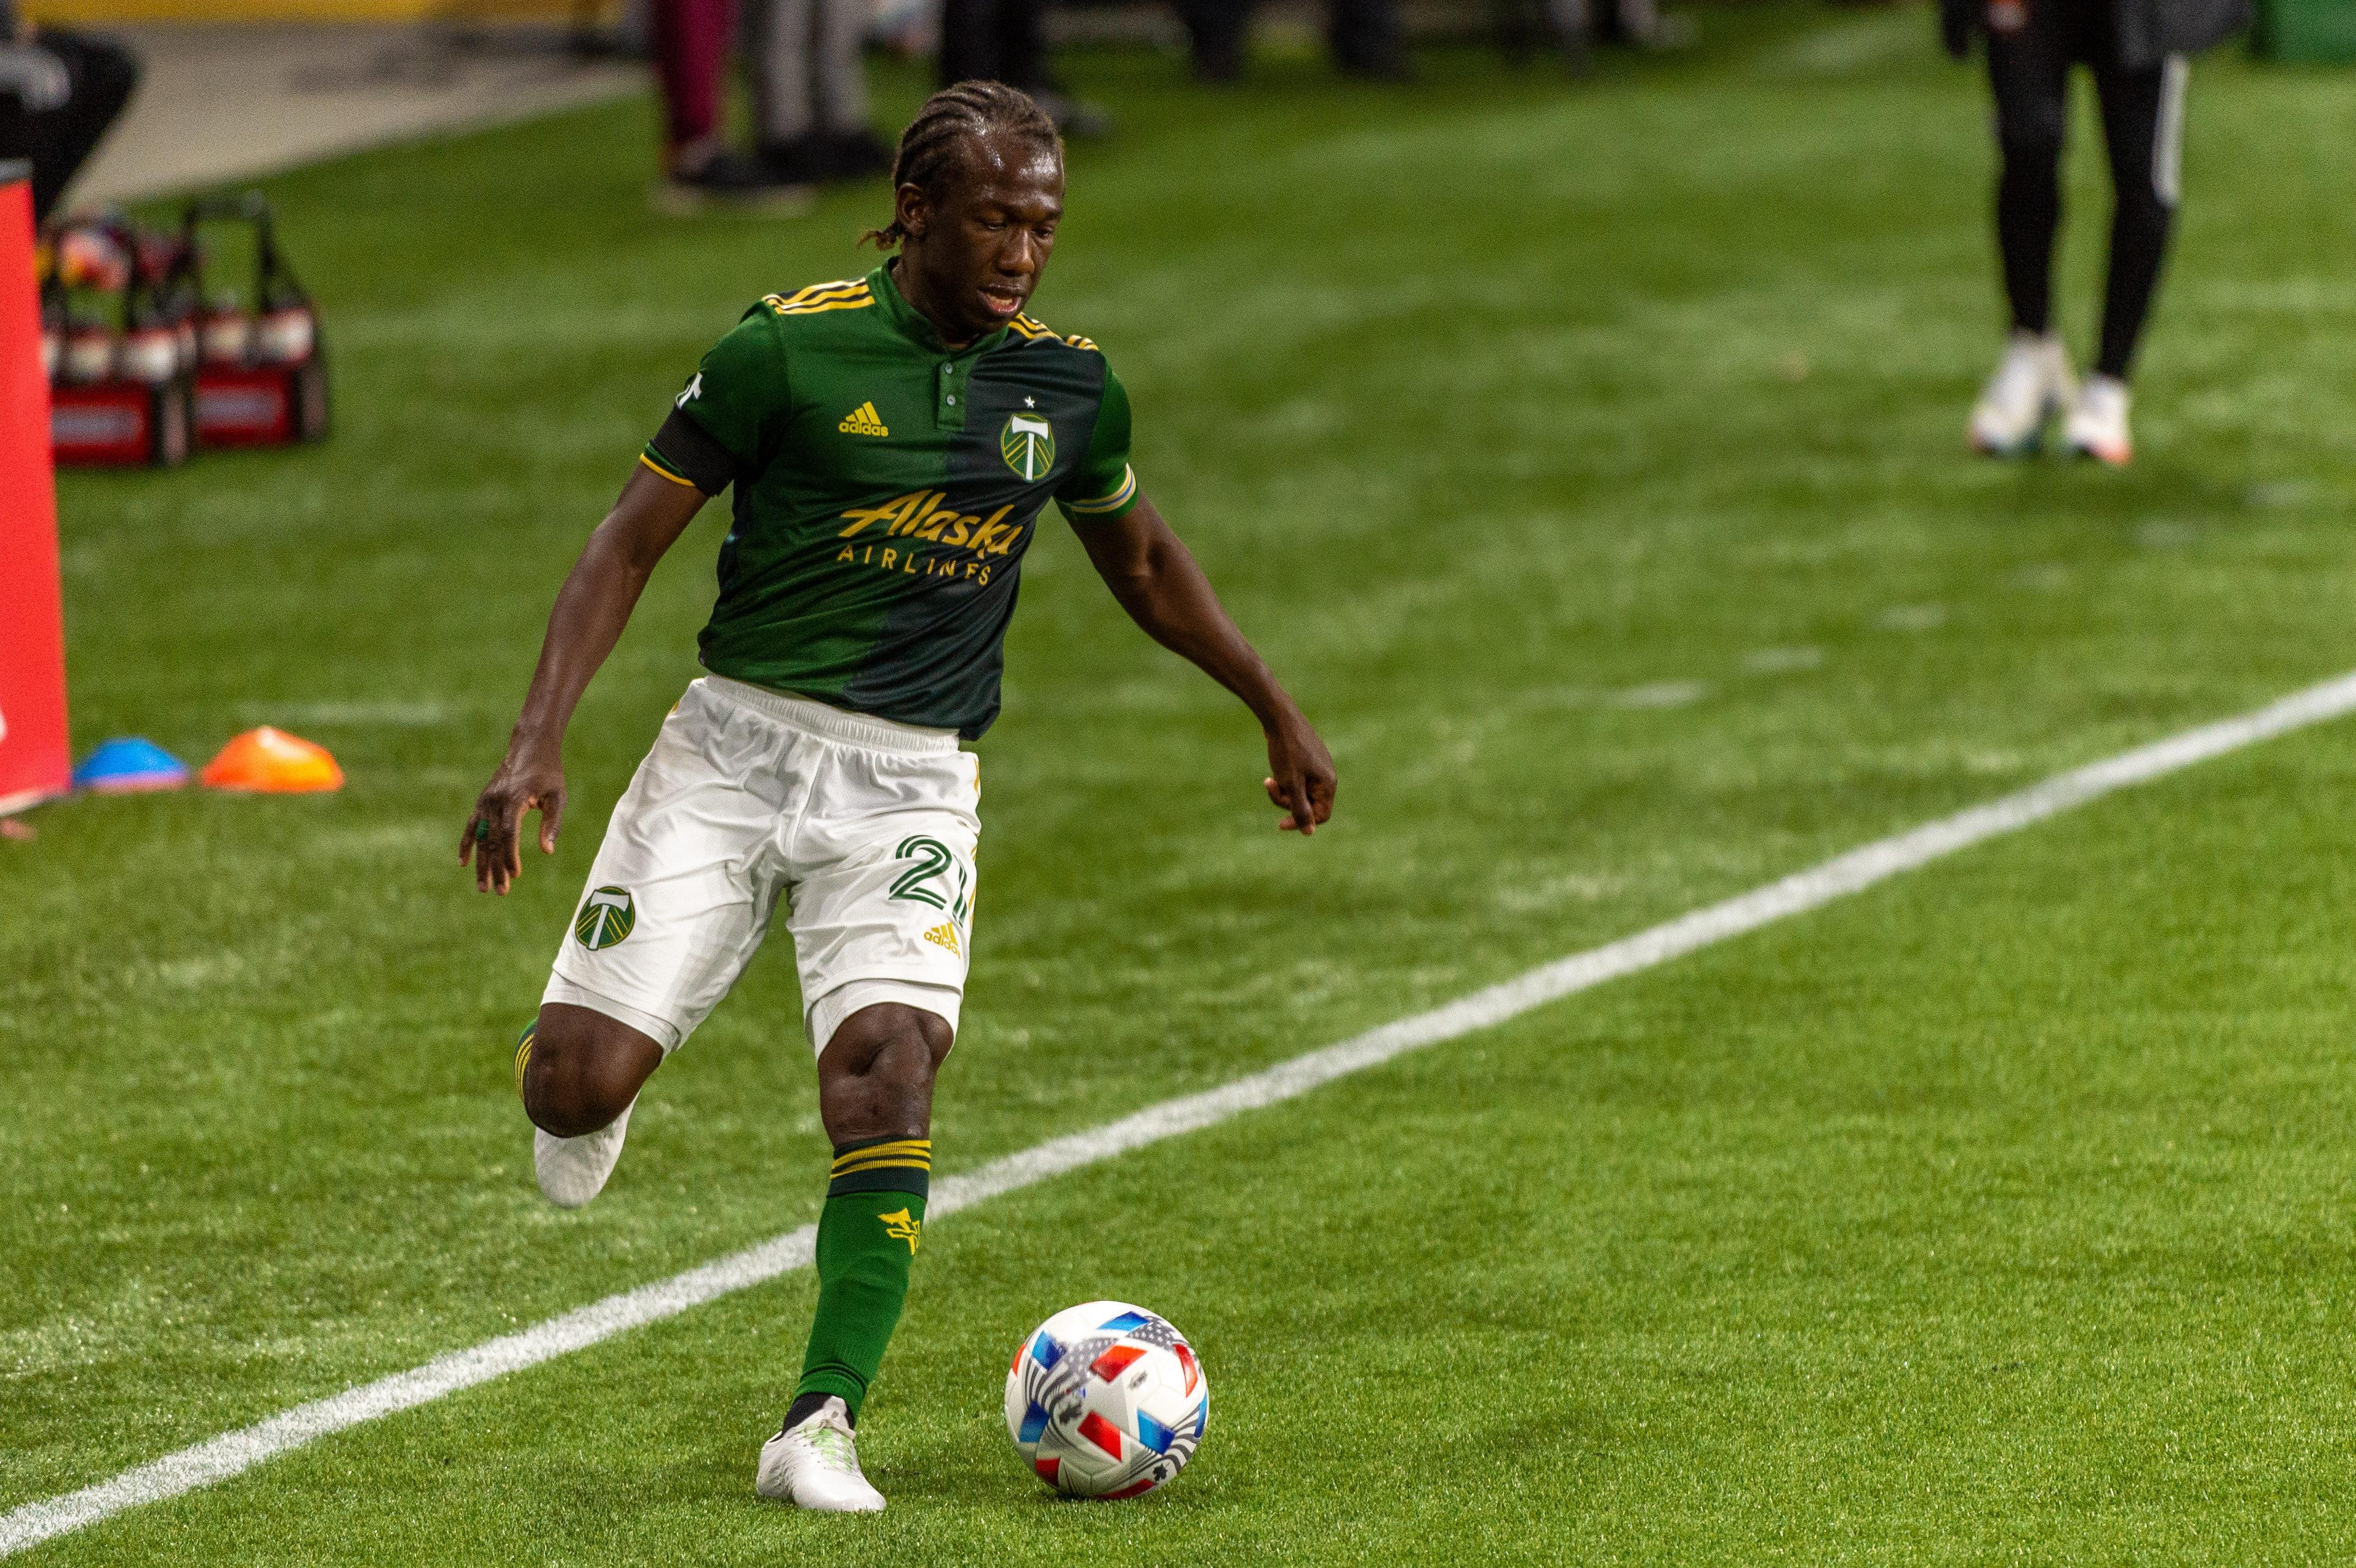 SOCCER: APR 24 MLS - Houston Dynamo FC at Portland Timbers